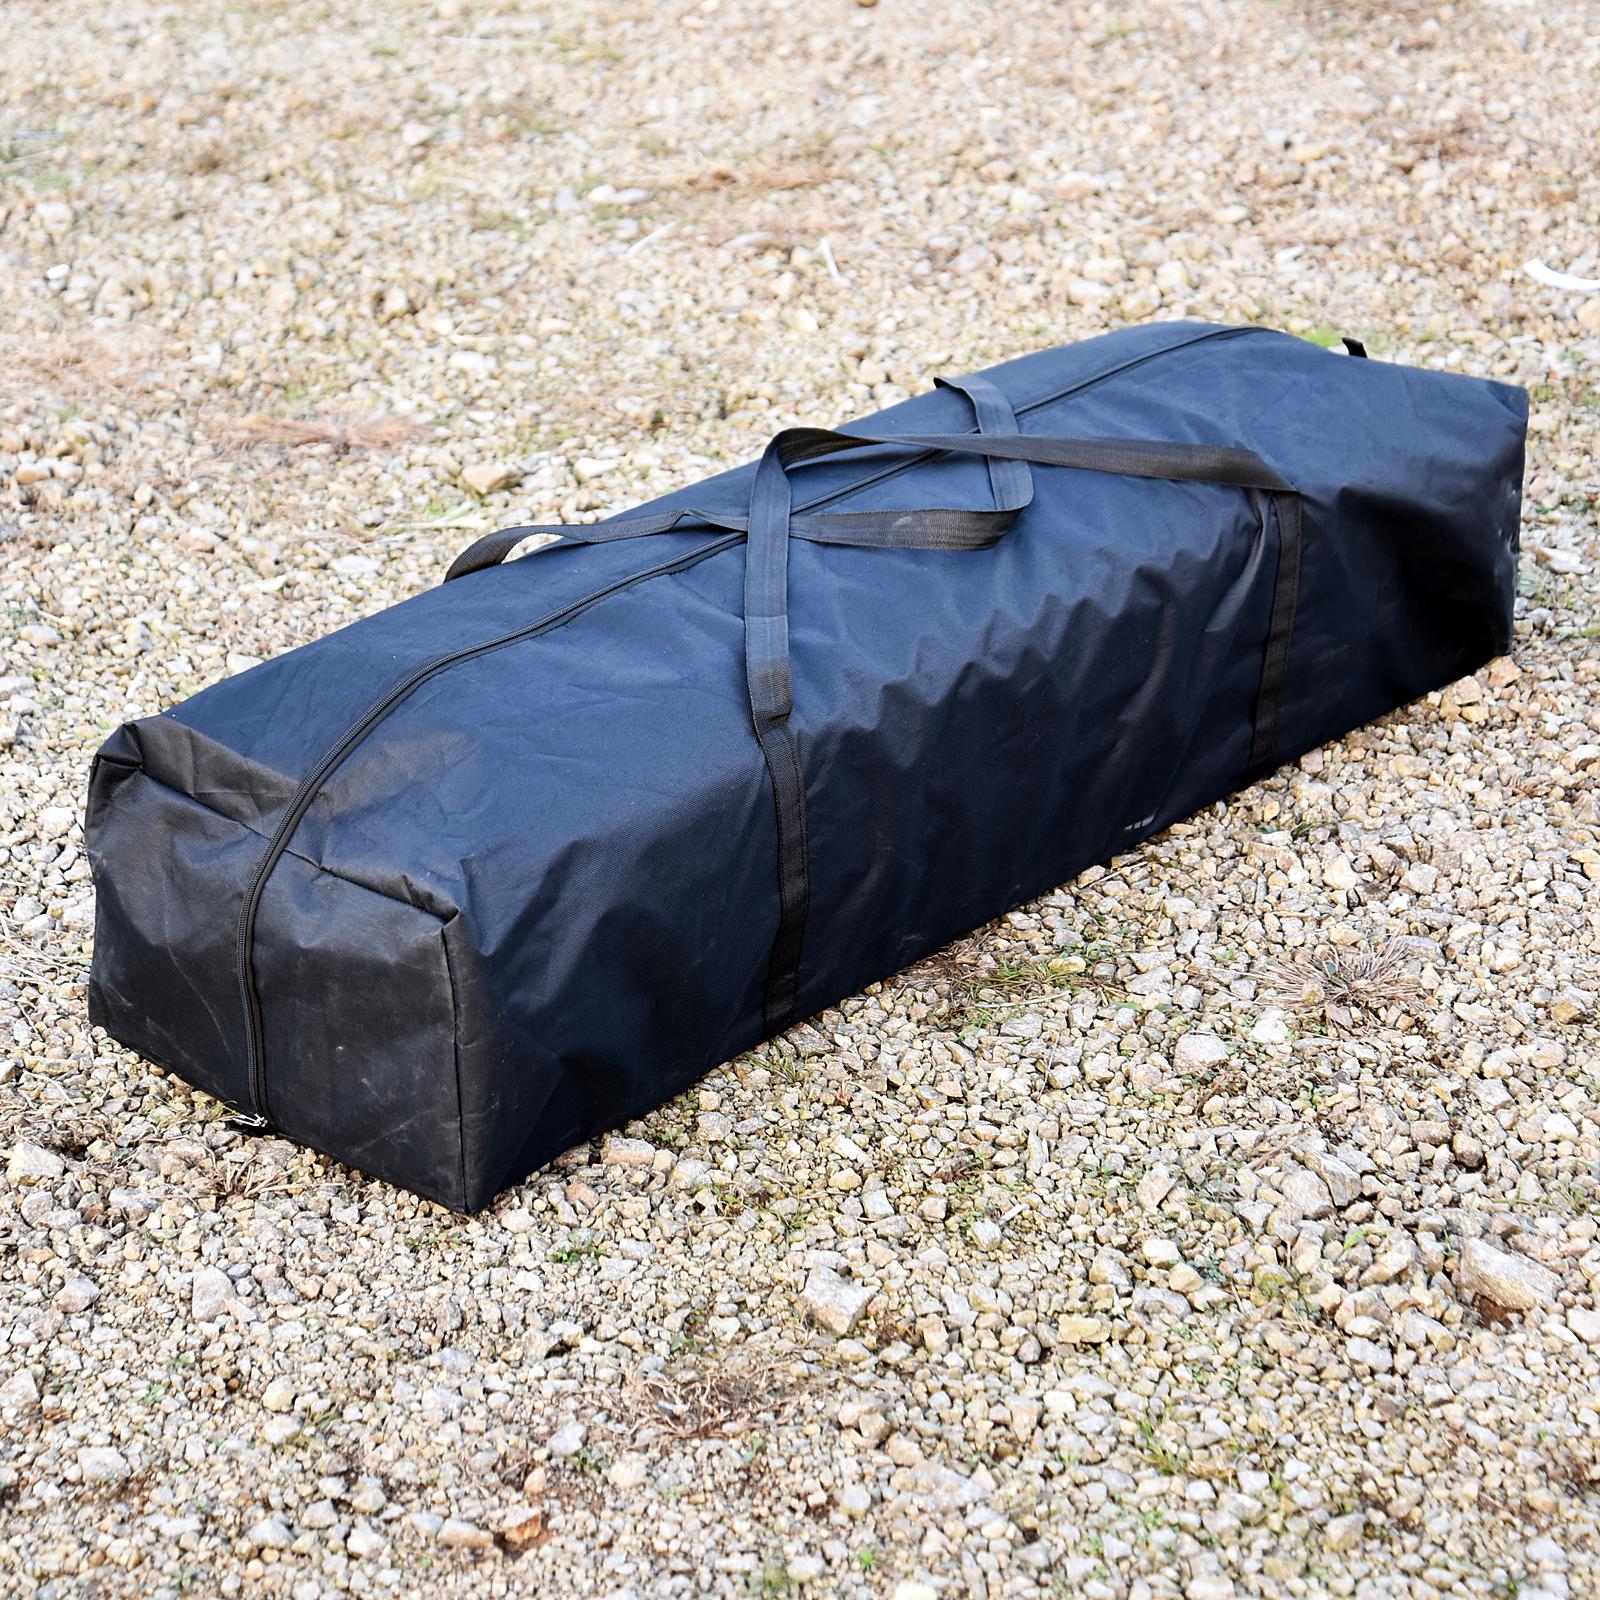 Outdoor-10-039-x20-039-EZ-POP-UP-Gazebo-Wedding-Party-Tent-Canopy-Folding-w-Carry-Bag thumbnail 9